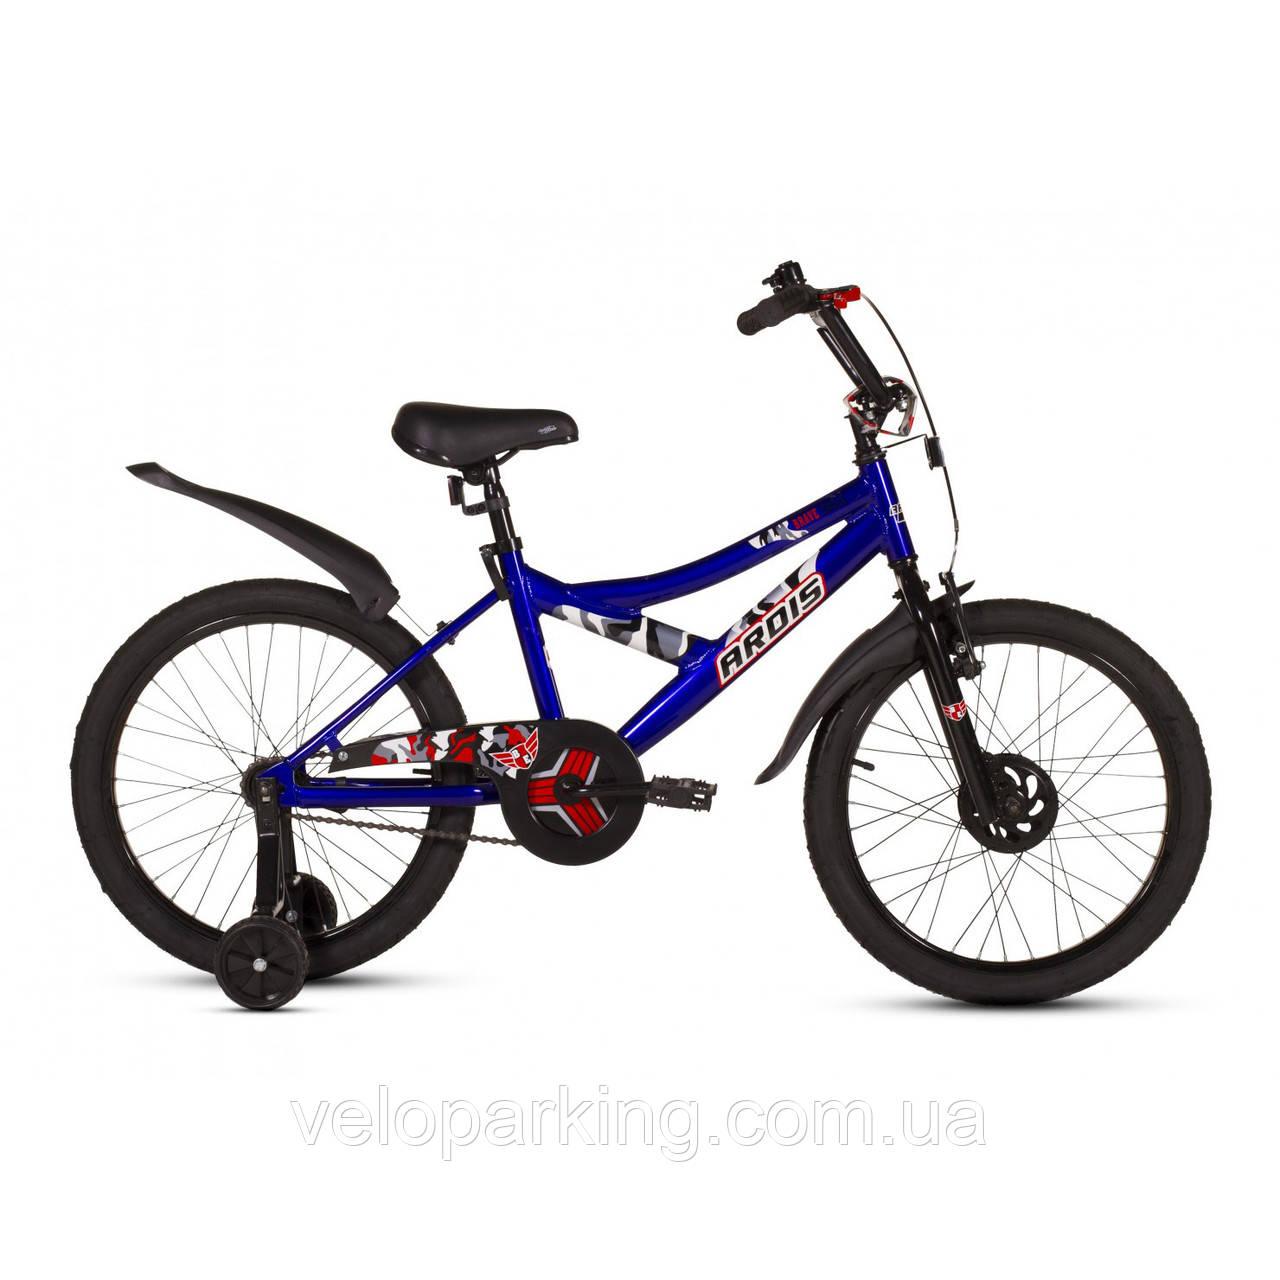 Детский велосипед 16 Brave Eagle Ardis (2020) new